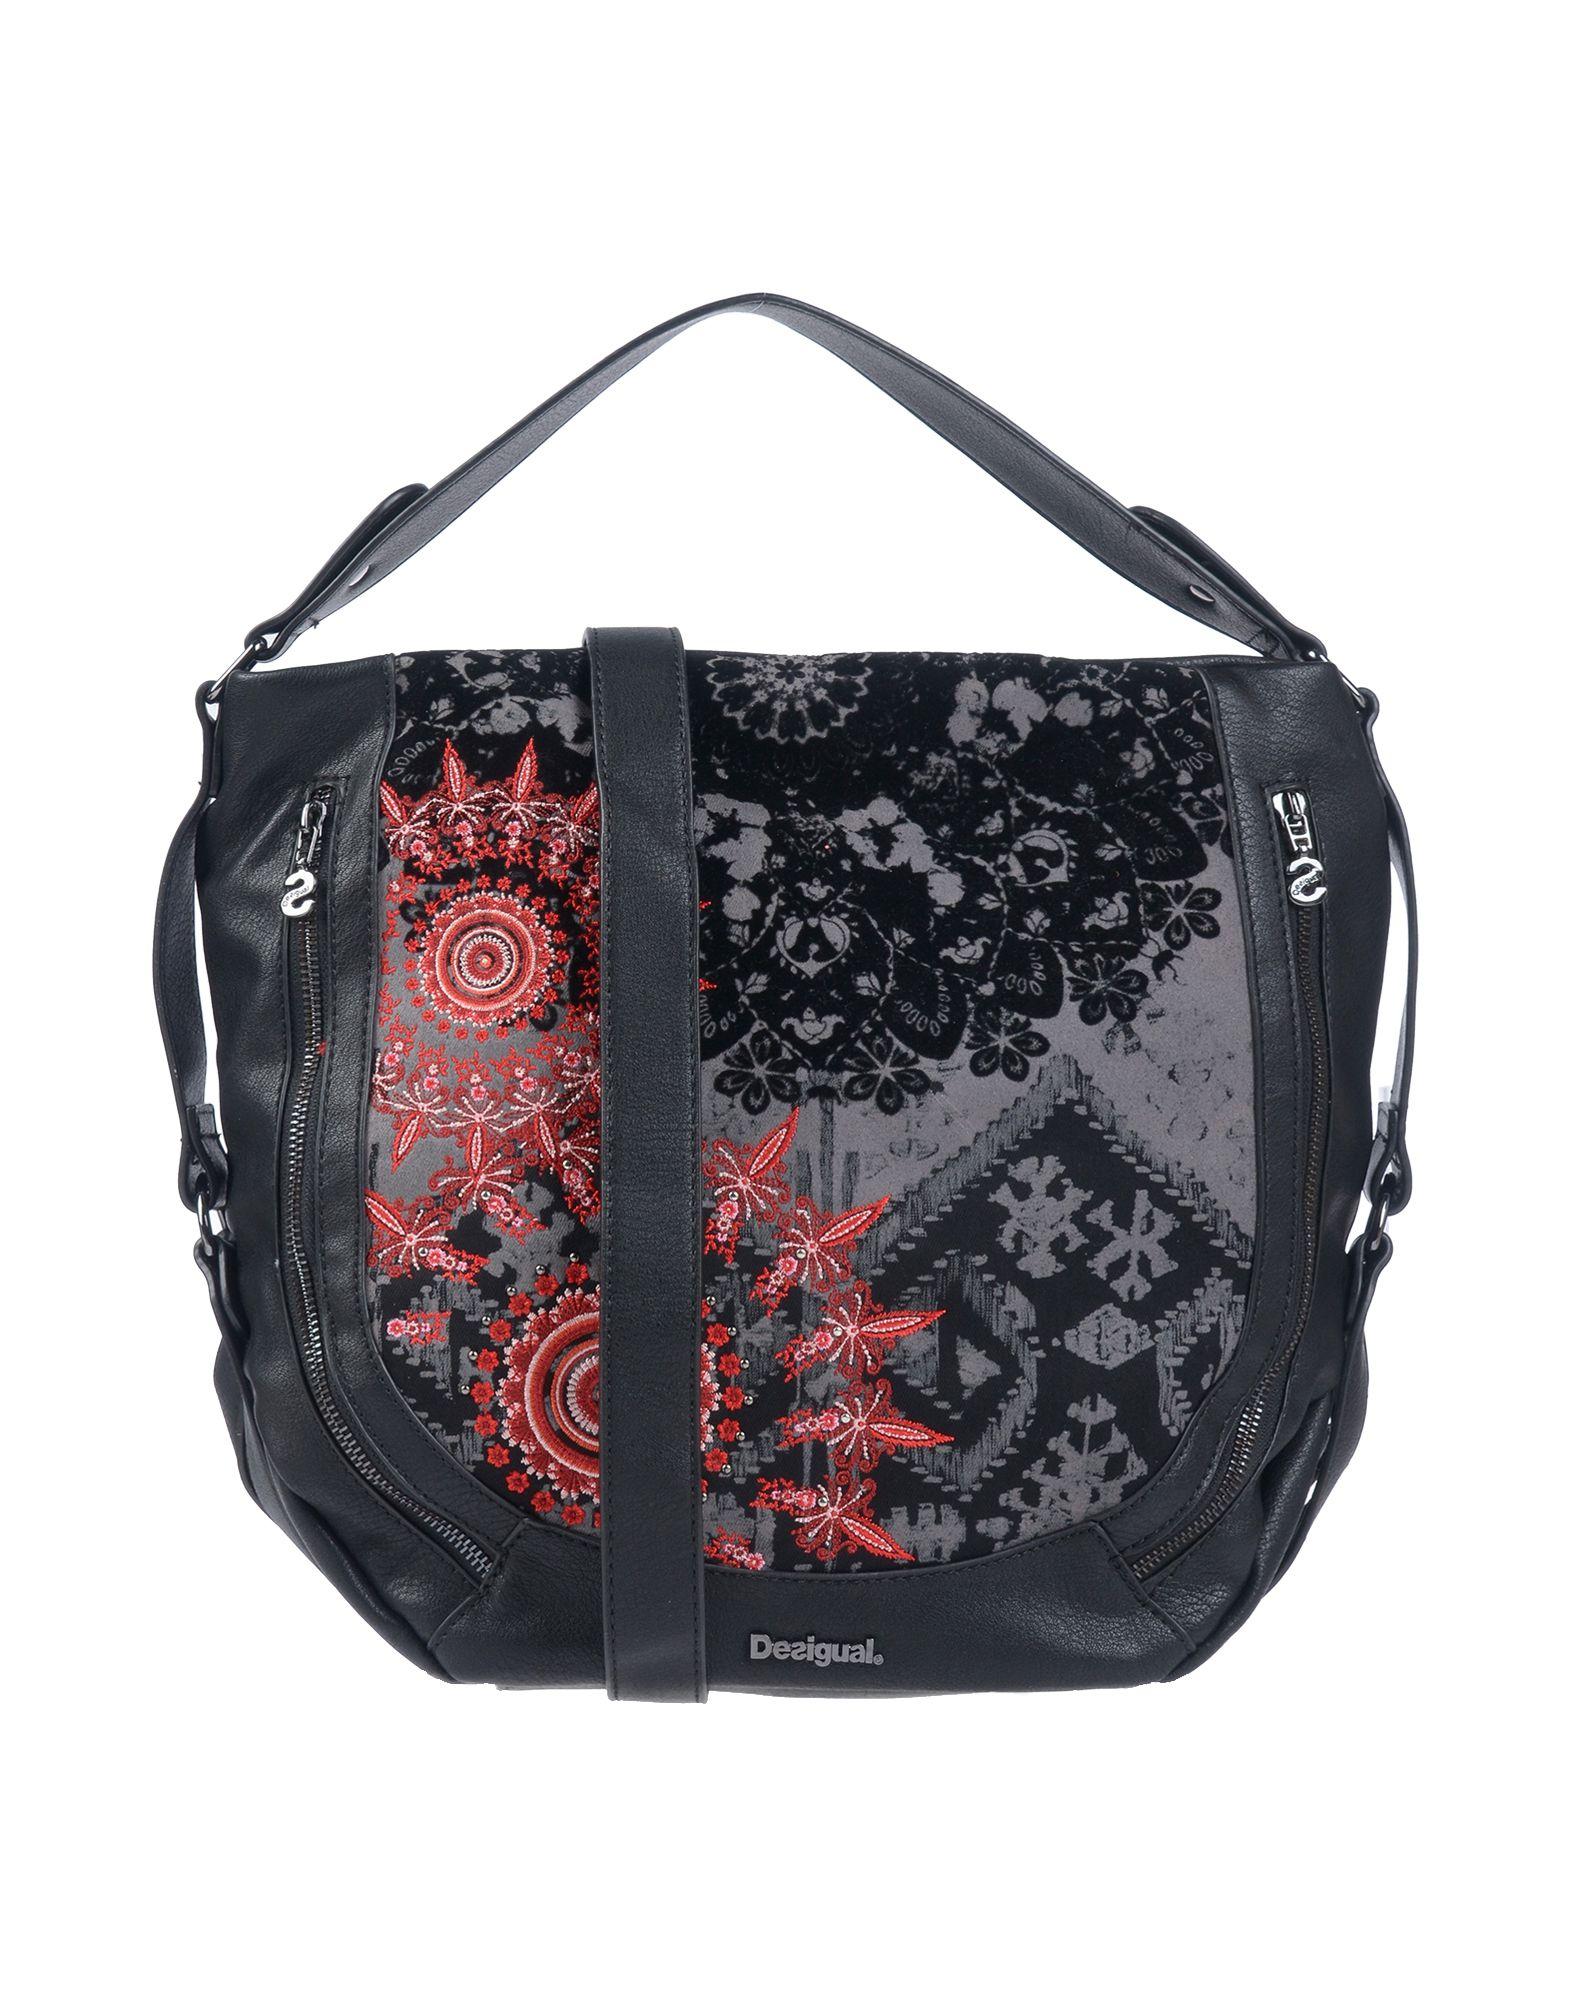 40494b59500c Desigual Handbag - Women Desigual Handbags online on YOOX Hong Kong ...